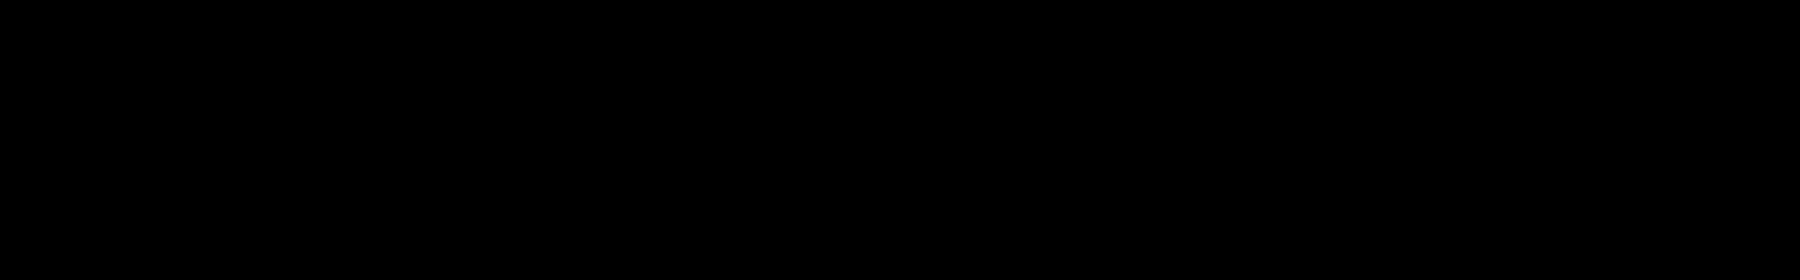 Elevator - Nora En Pure Style Ableton Template audio waveform